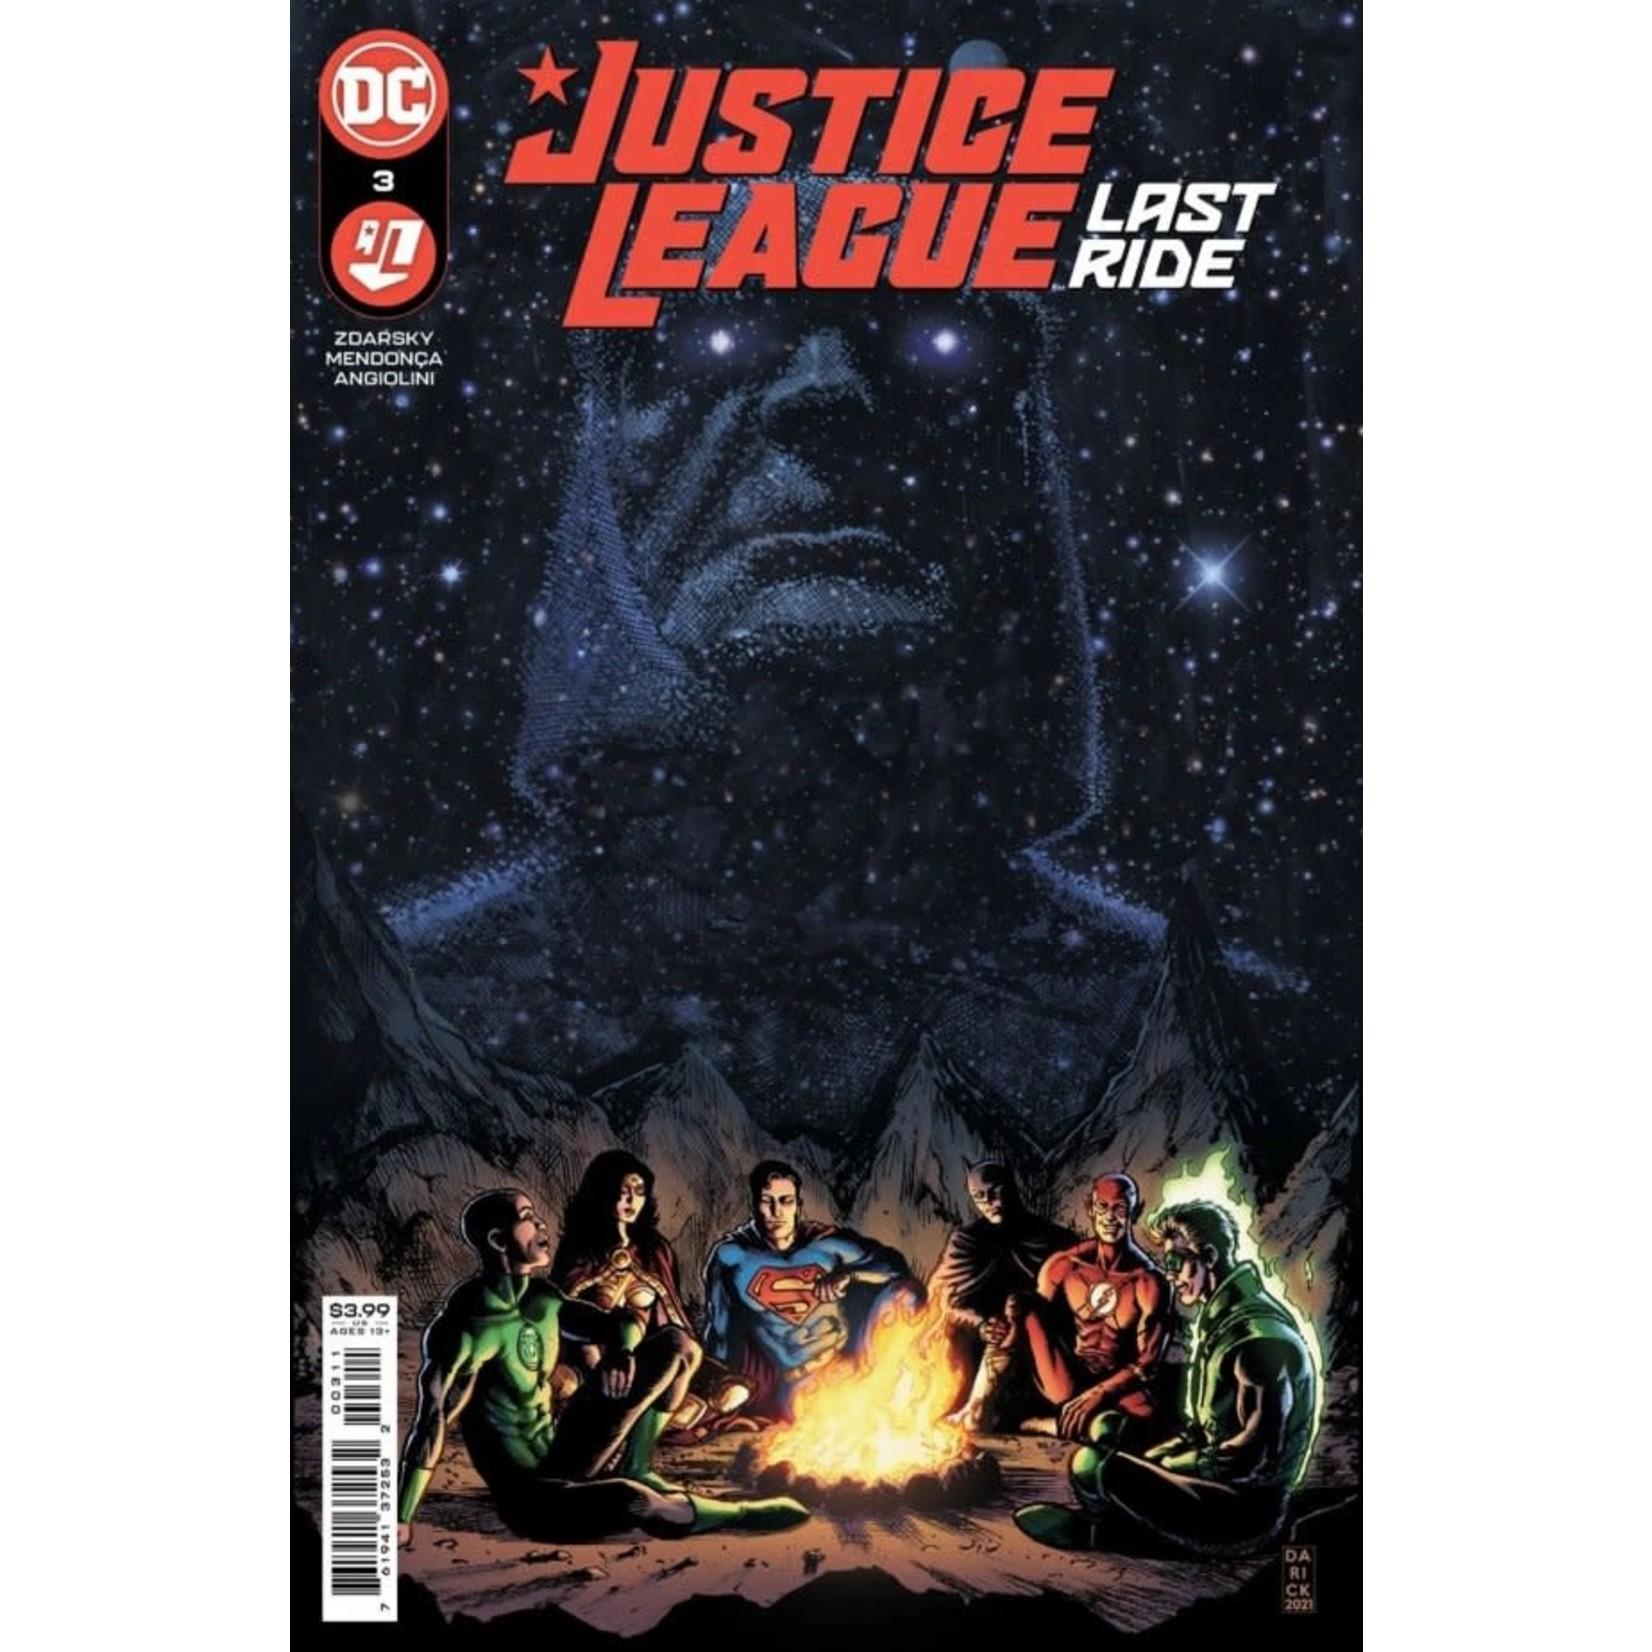 DC Comics Justice league Last Ride #3